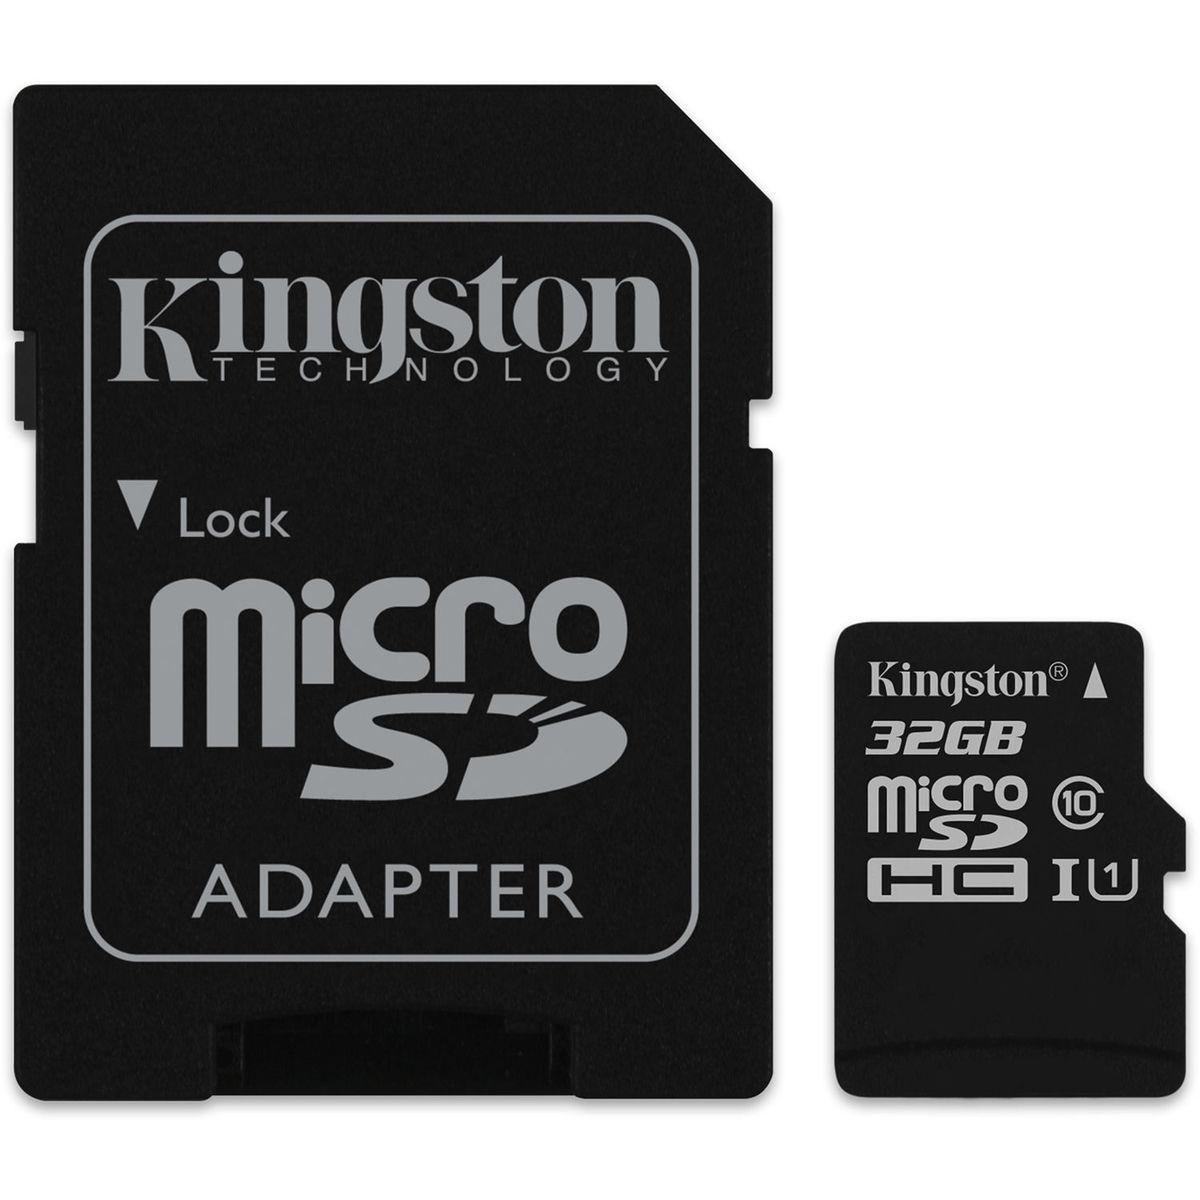 32GB Class 10 MicroSDHC Card